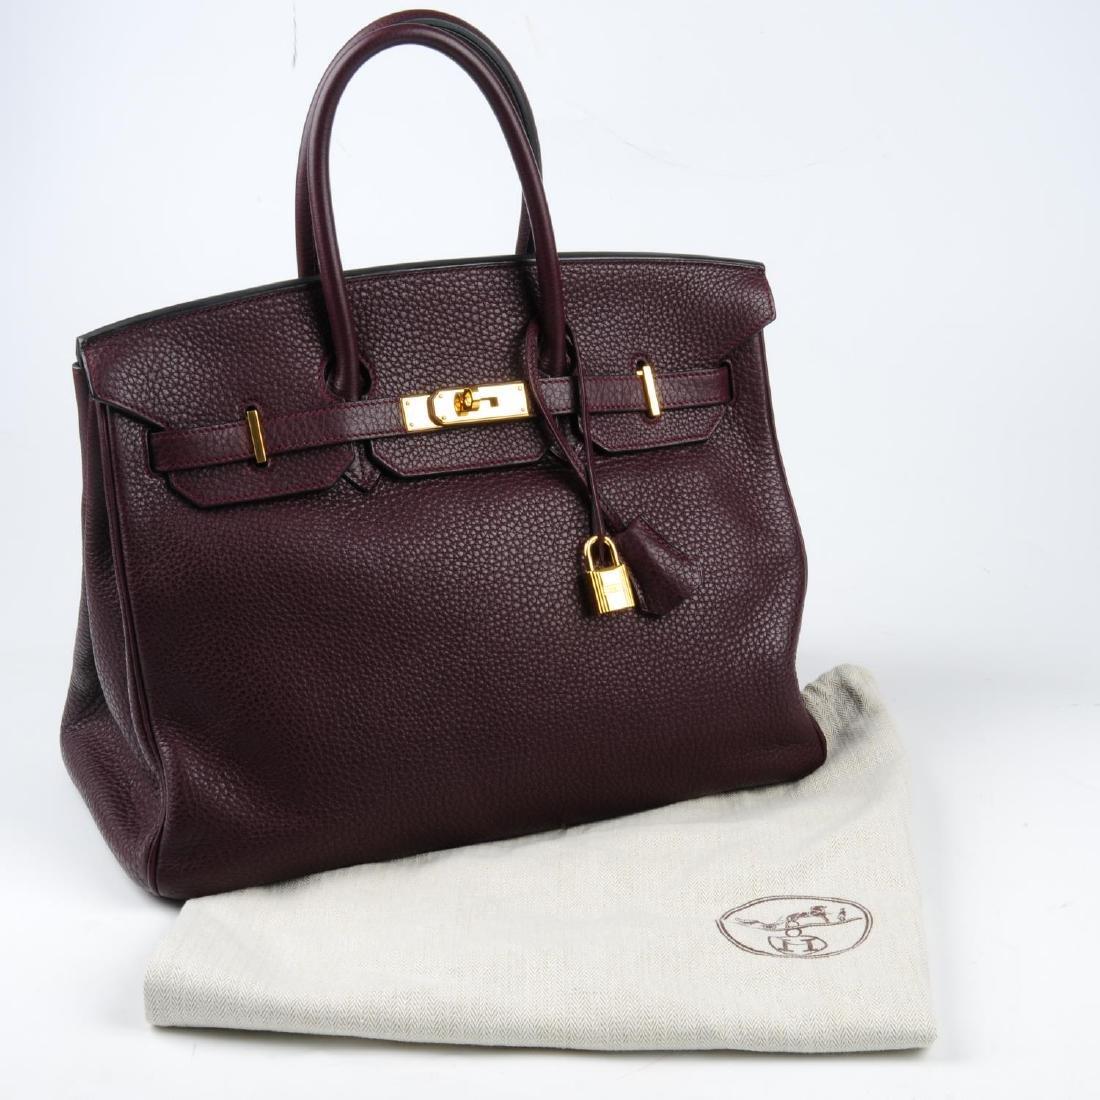 HERMÈS - a plum Clemence Birkin 35 handbag. Designed - 4